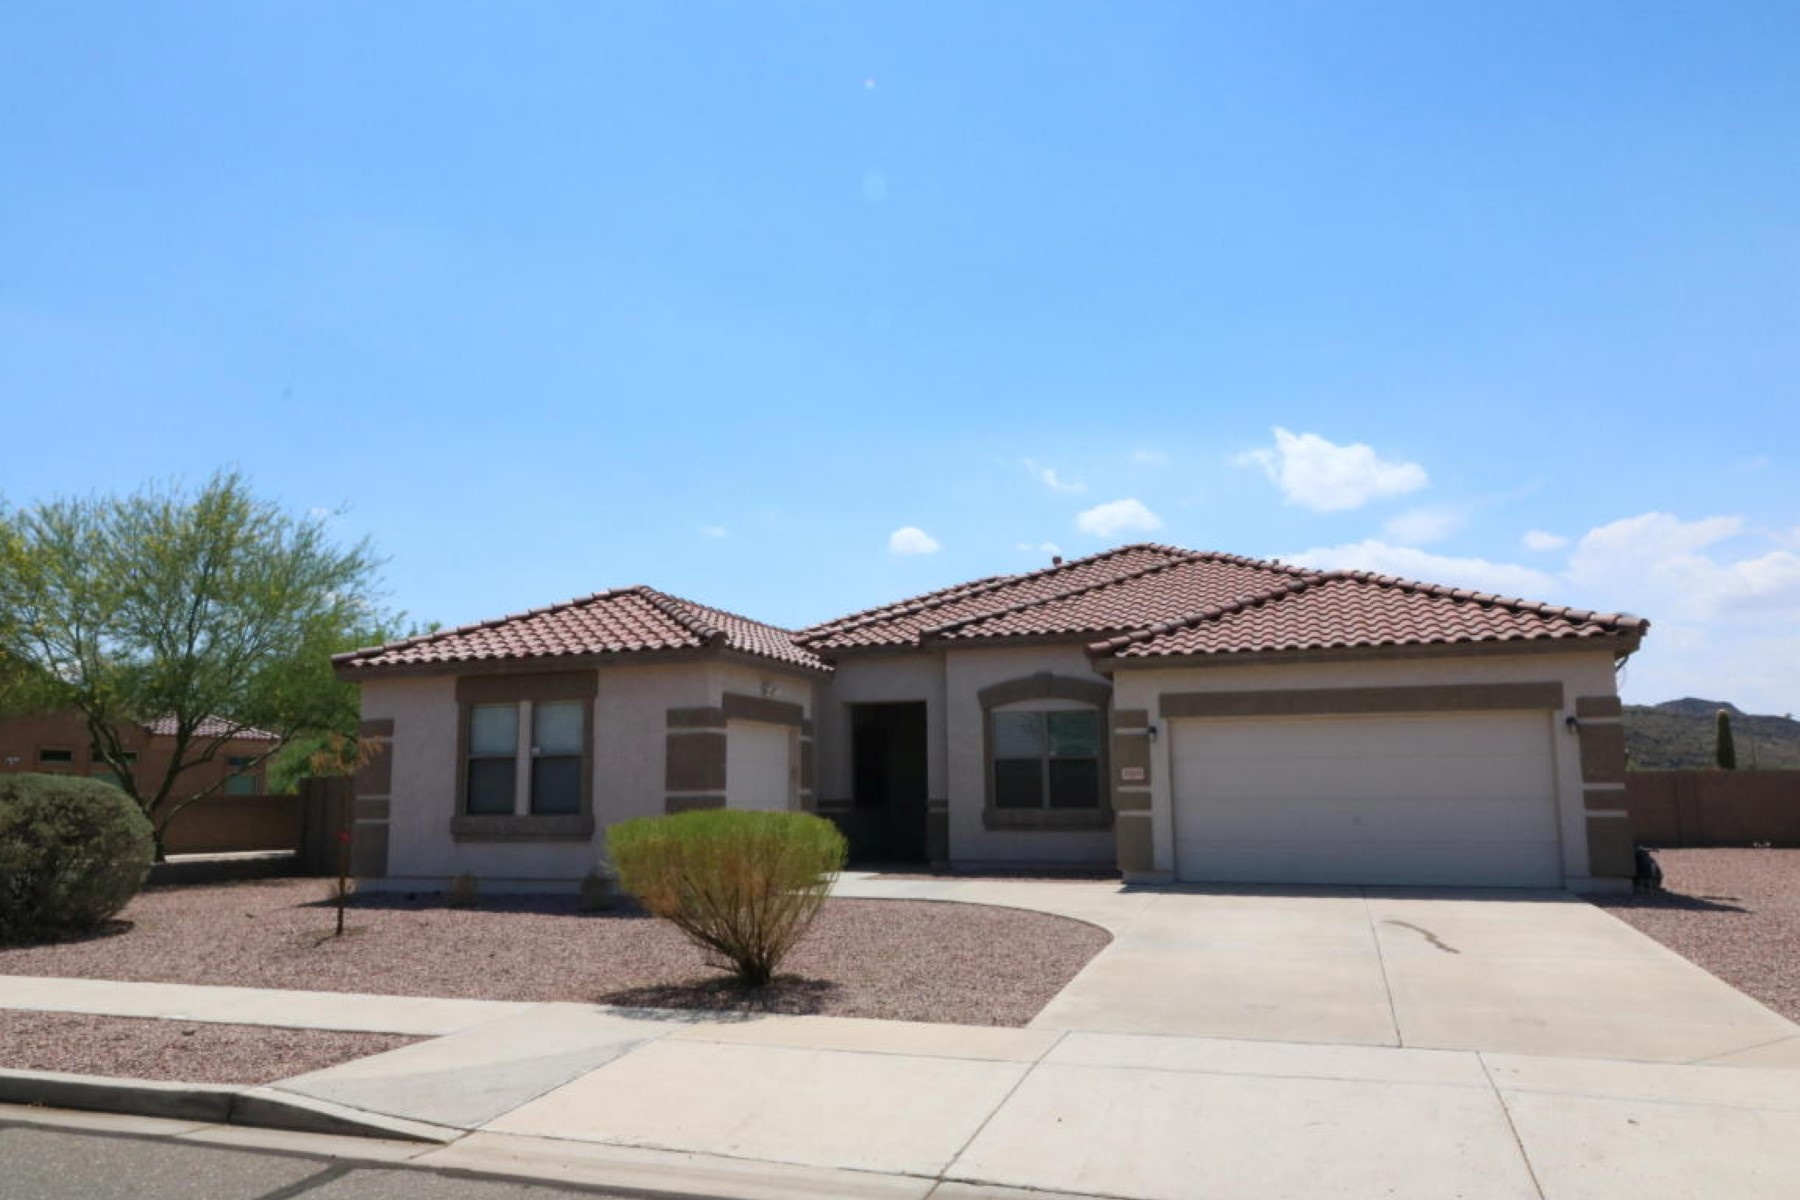 Single Family Home for Sale at Beautiful home in Arizona Silverado community 26804 N 32nd Ln Phoenix, Arizona, 85083 United States